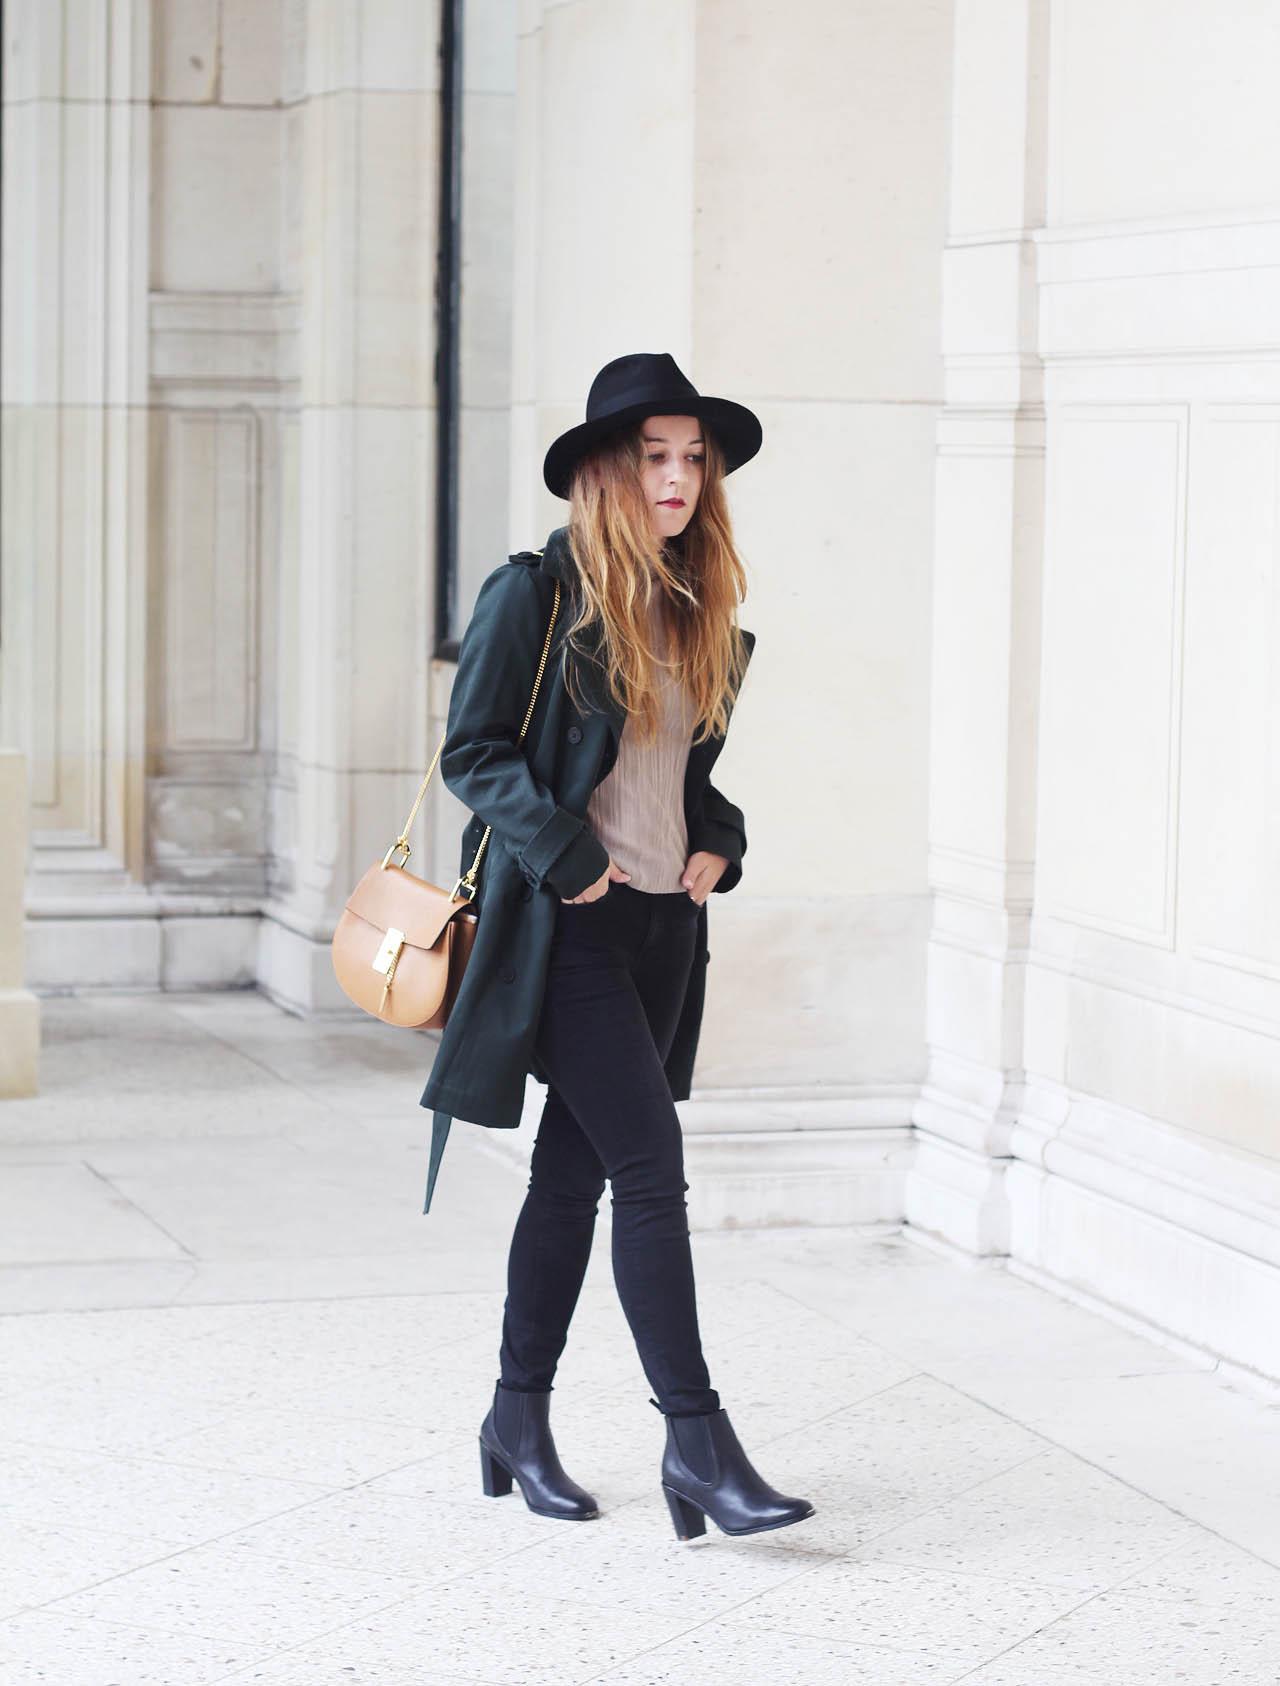 Trench boots elodie in paris - Instagram comptoir des cotonniers ...